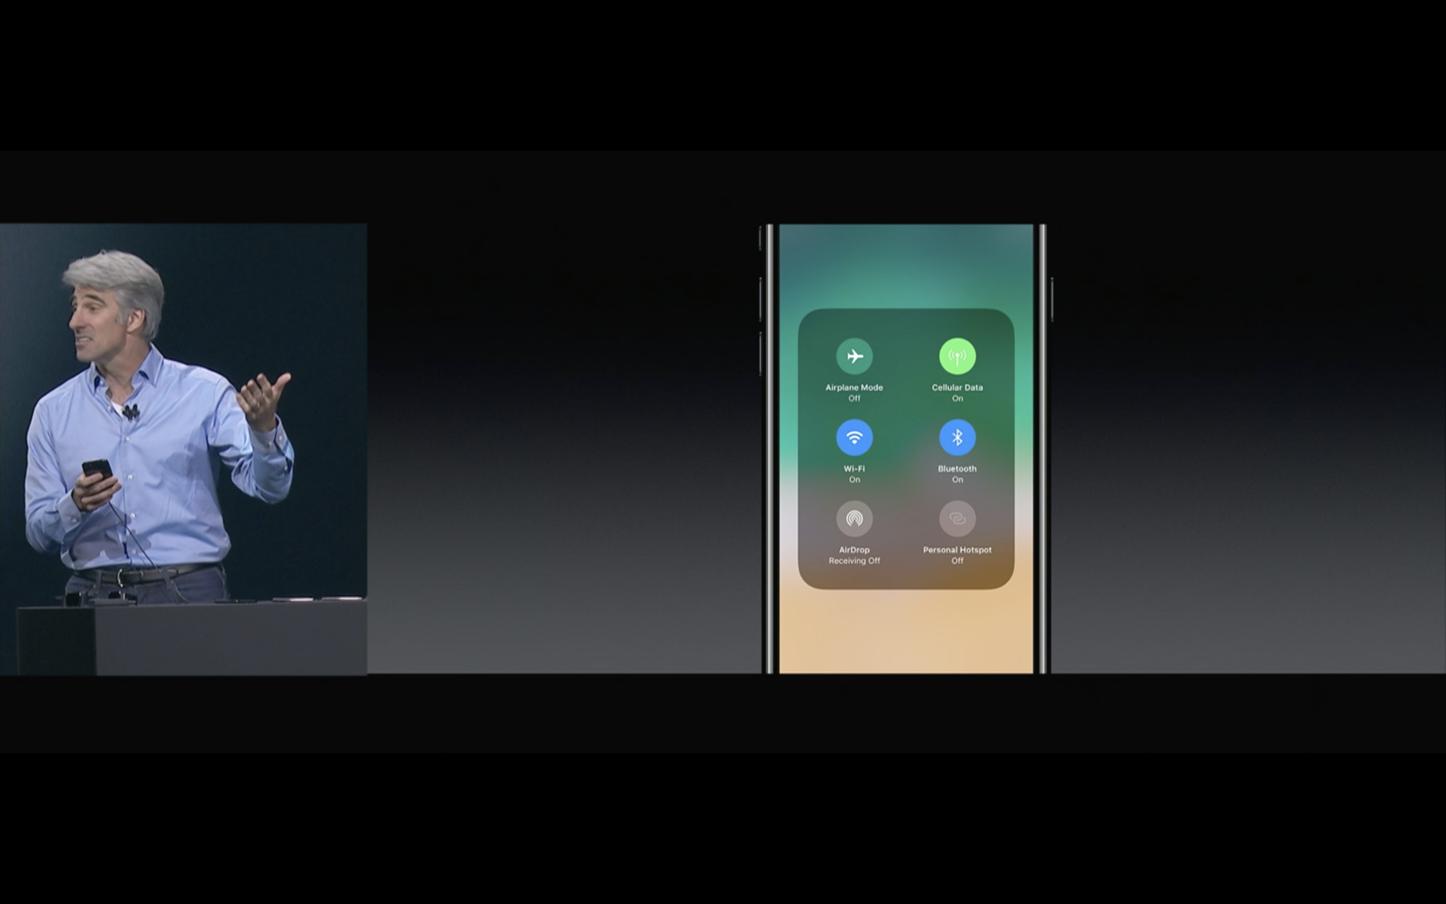 iOS11-2017-WWDC17-36.png